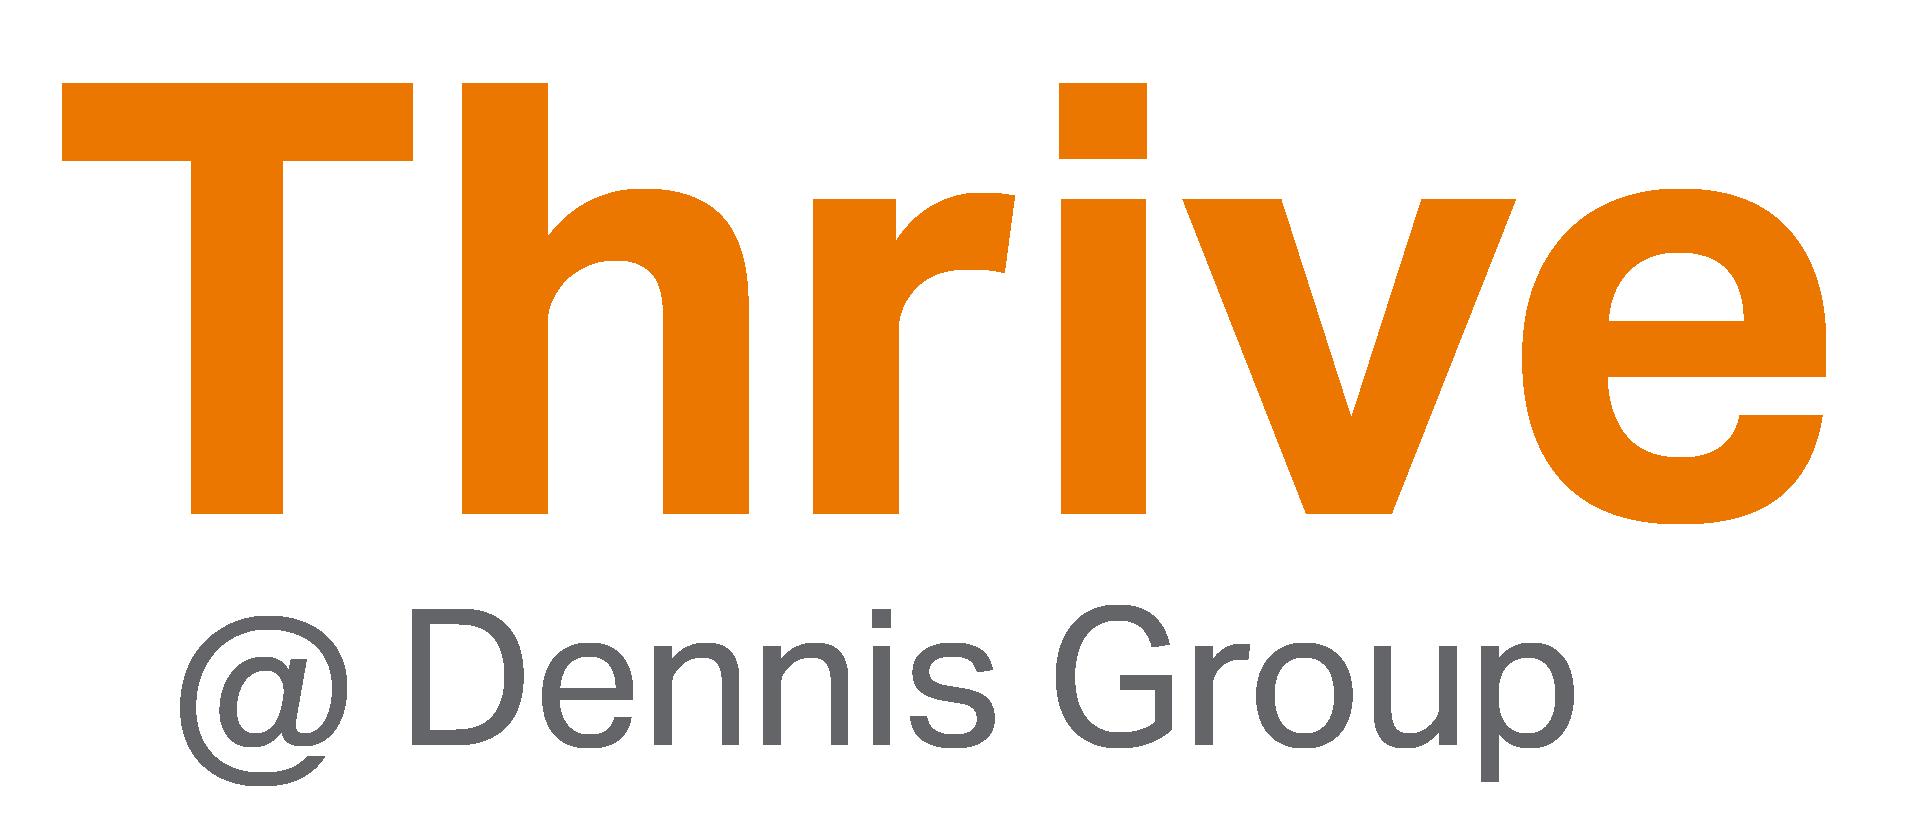 HeaderText_300ppi_Thrive_Orange